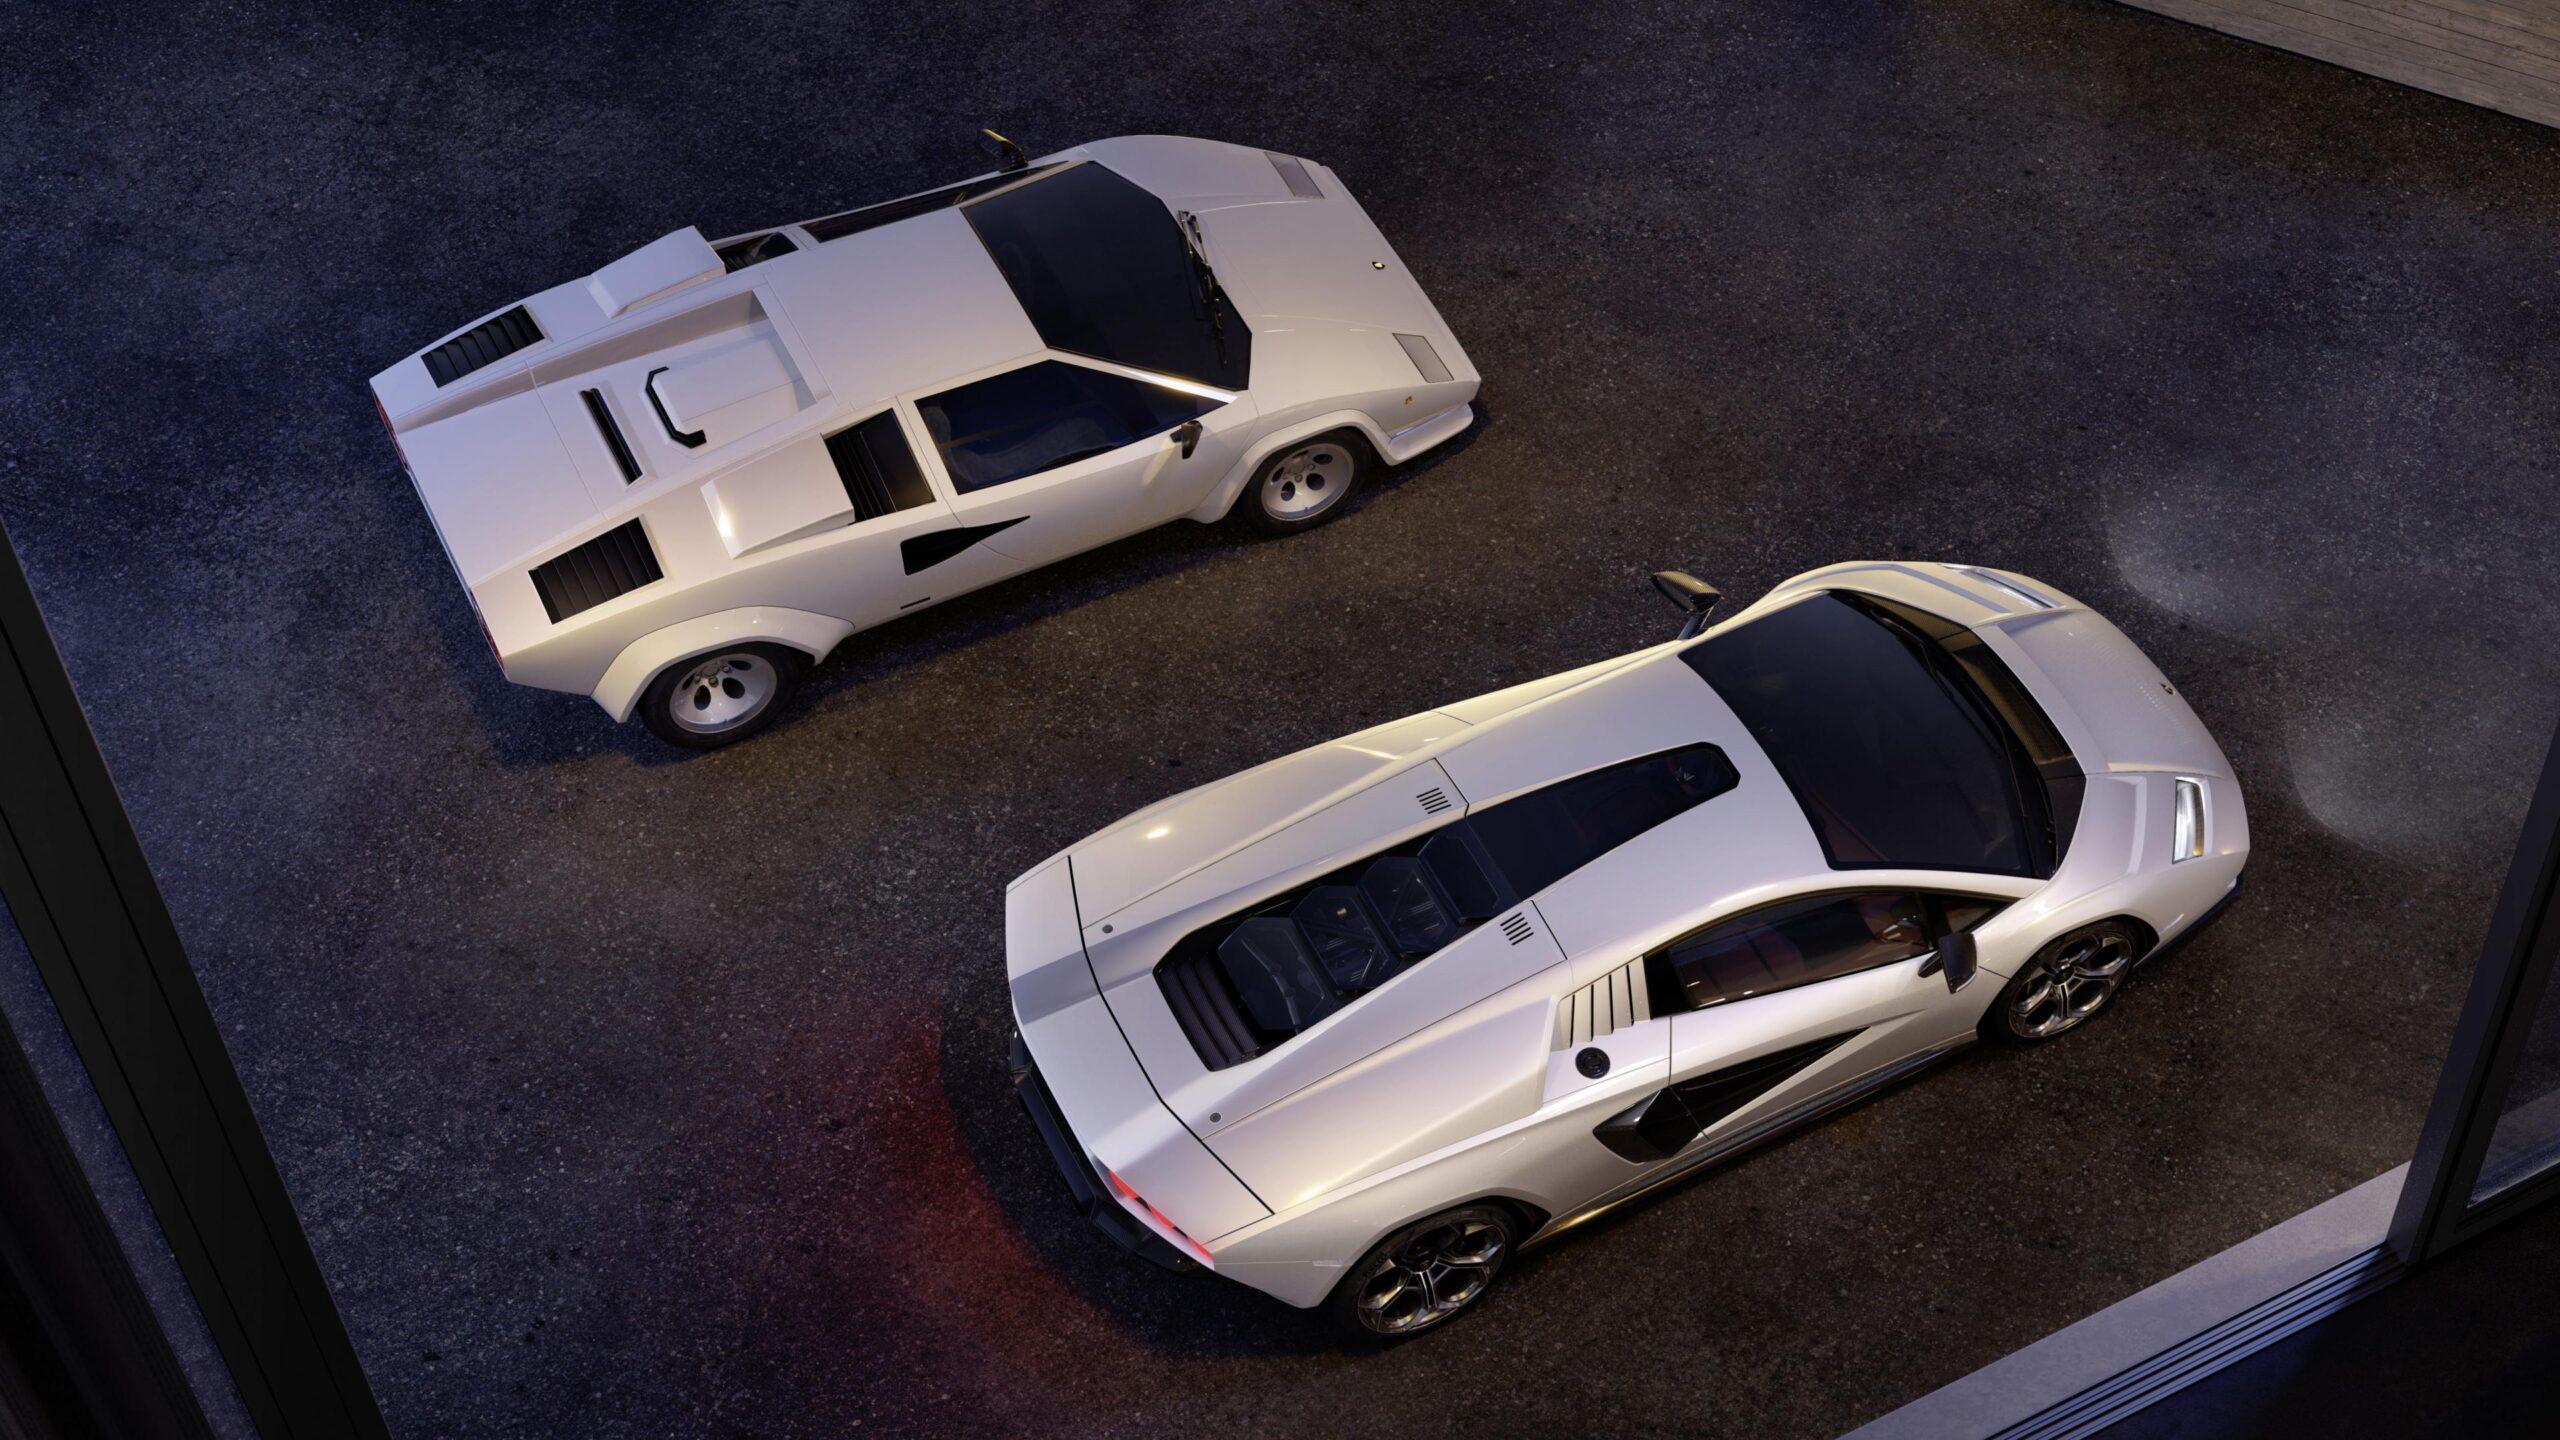 Lamborghini Countach LPI 800-4: tornano gli anni Ottanta in chiave ibrida